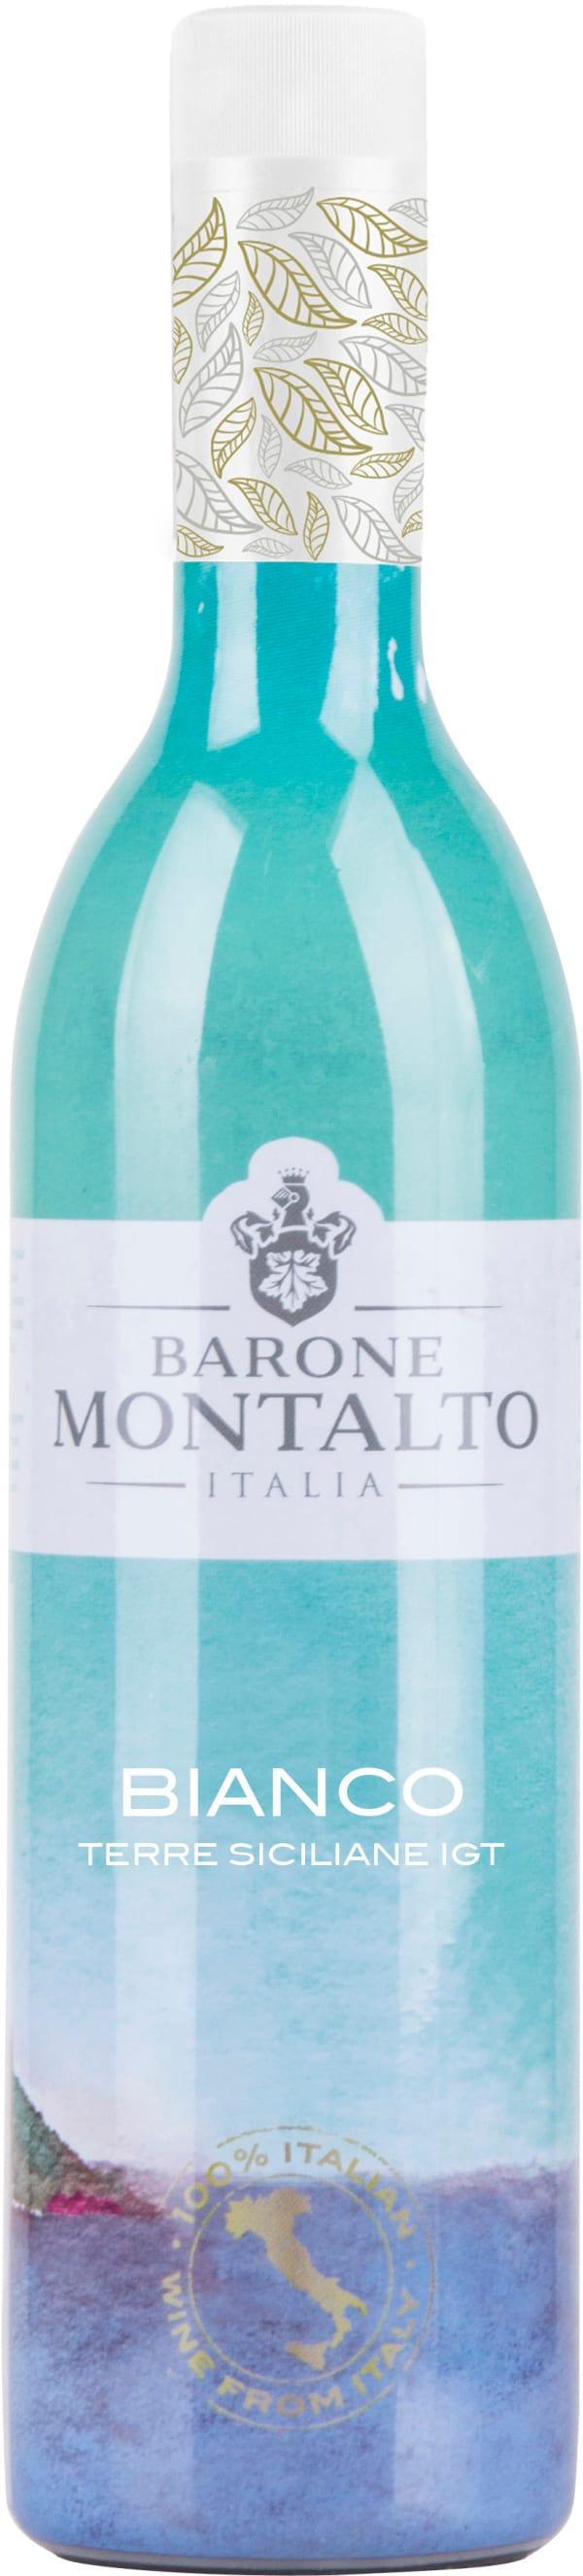 Montalto Bianco 2017 plastic bottle